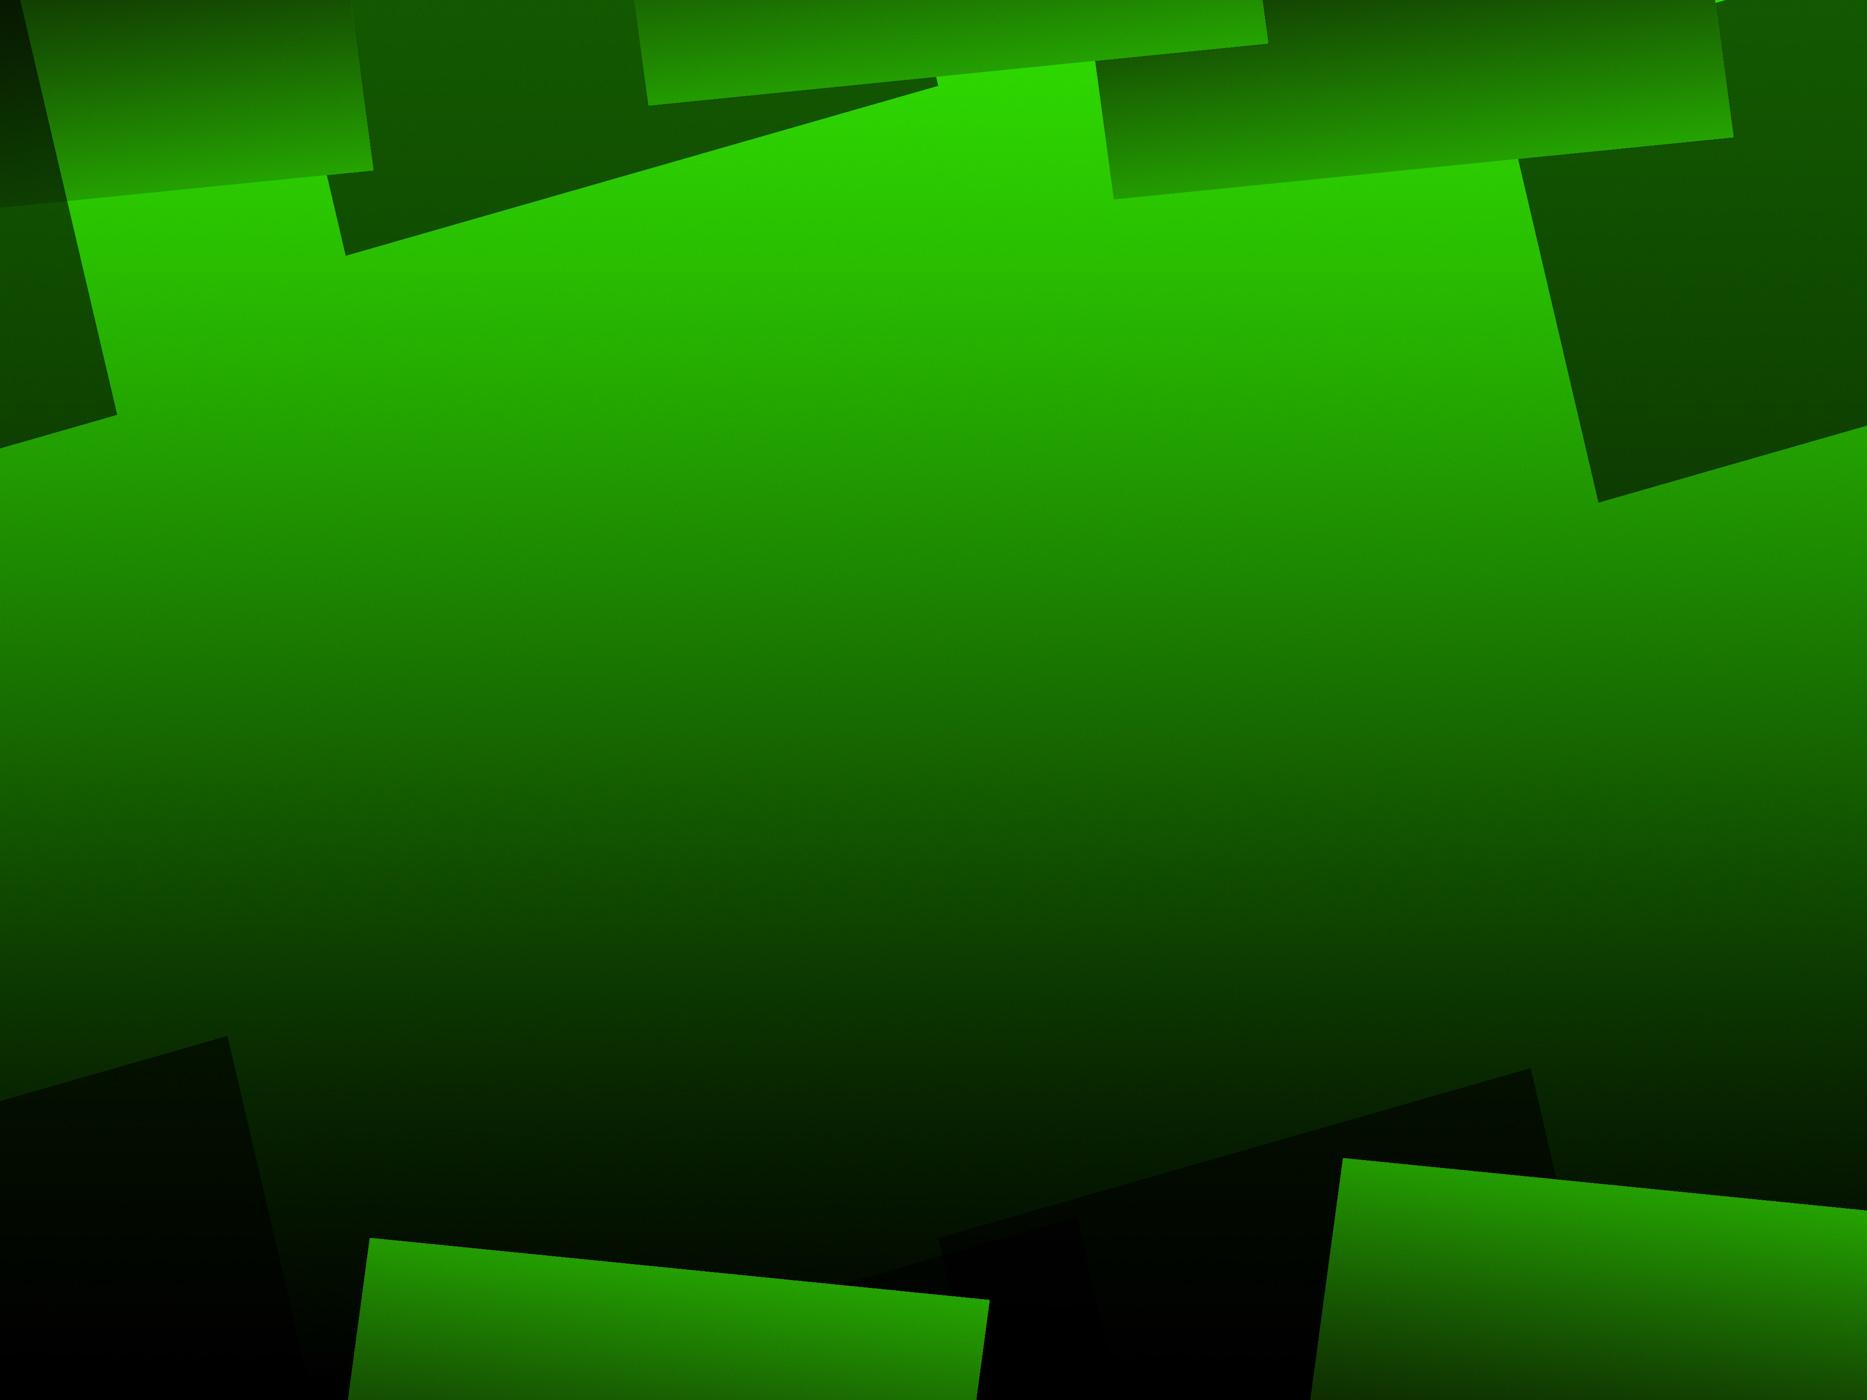 Green Geometric Background Means Digital Art Pattern, Art, Colour, Design, Digital, HQ Photo